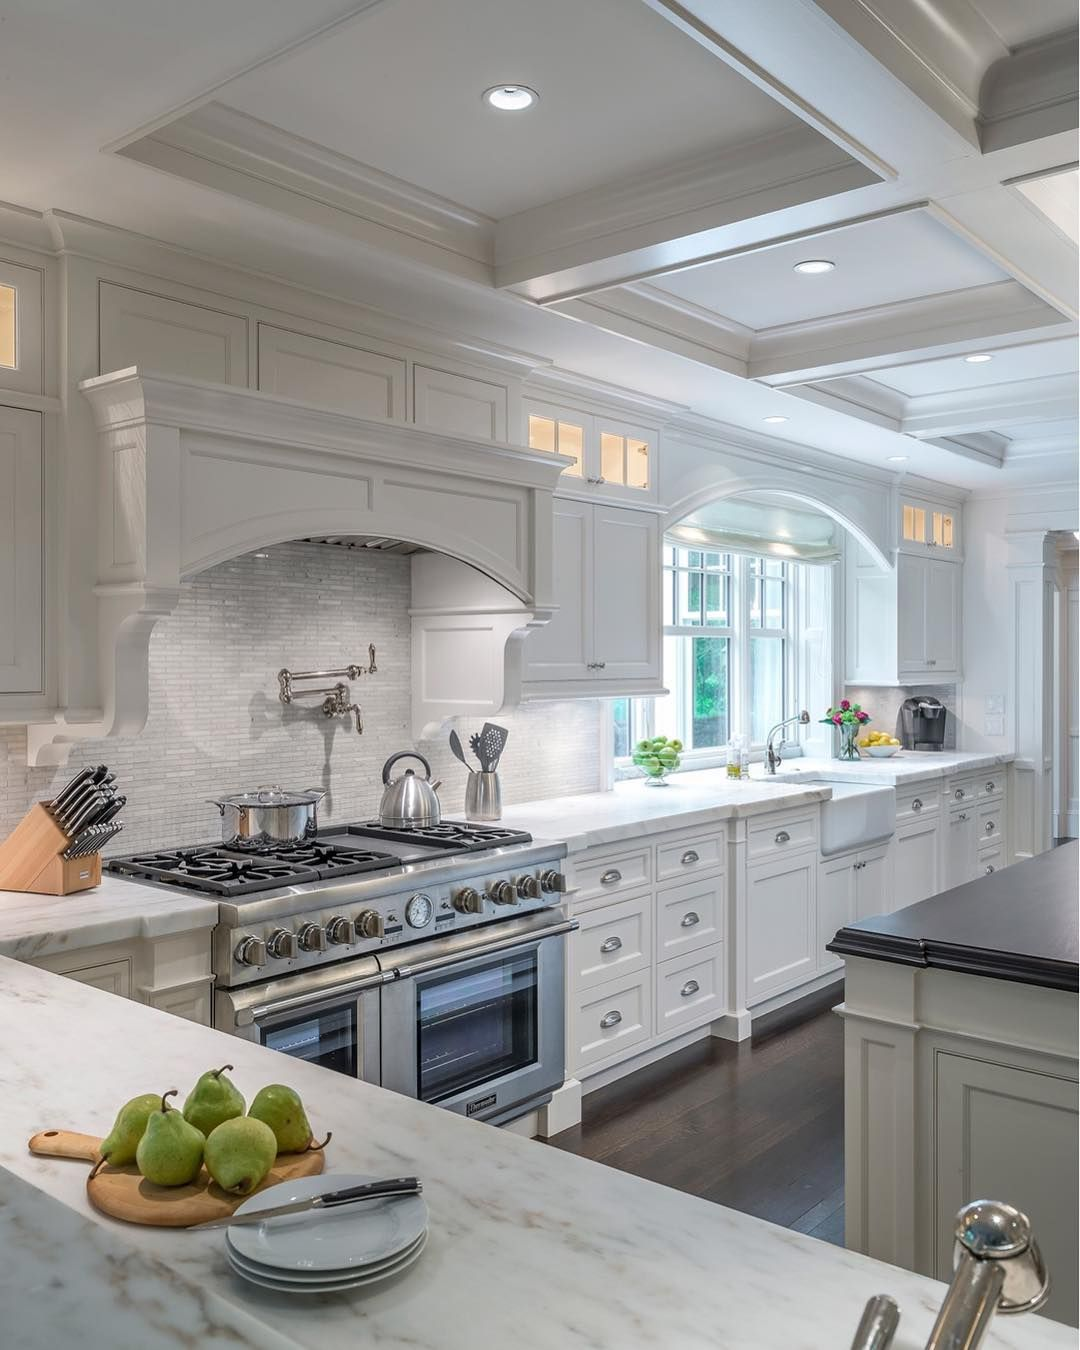 Boston Design Guide On Instagram White Kitchens And Dark Wood Floors Always A Winning Pair White Kitchen Design Kitchen Renovation Kitchen Cabinet Design